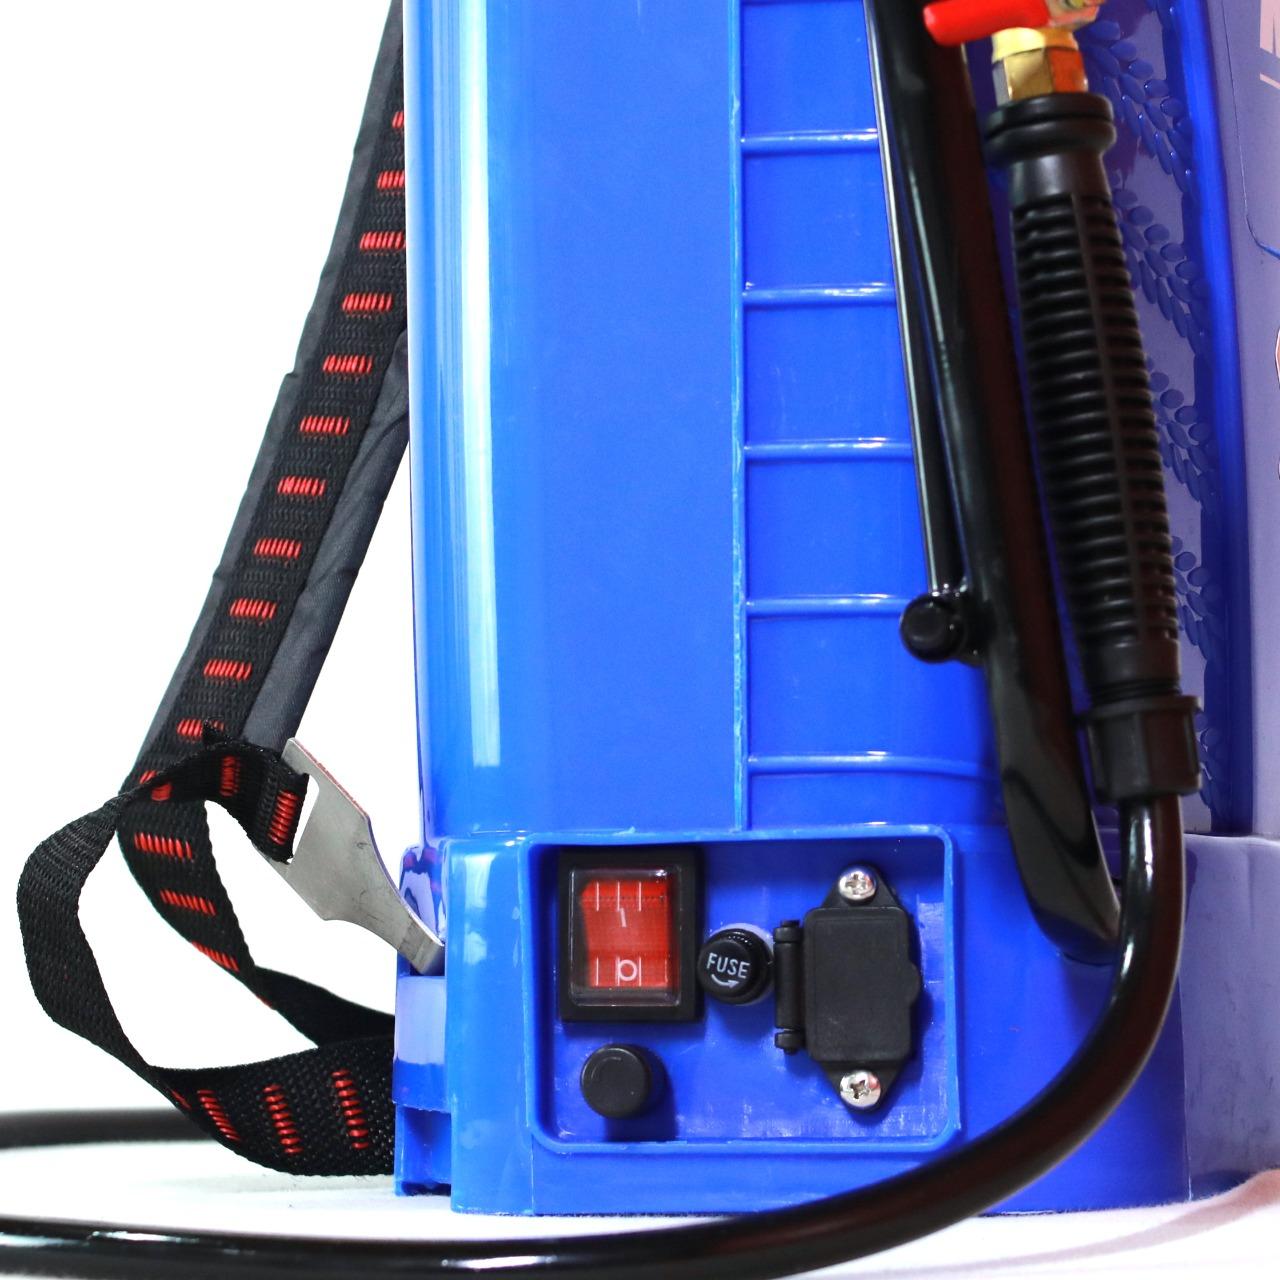 Pulverizador Elétrico E Manual Kawashima PEM-P20 20 Litros